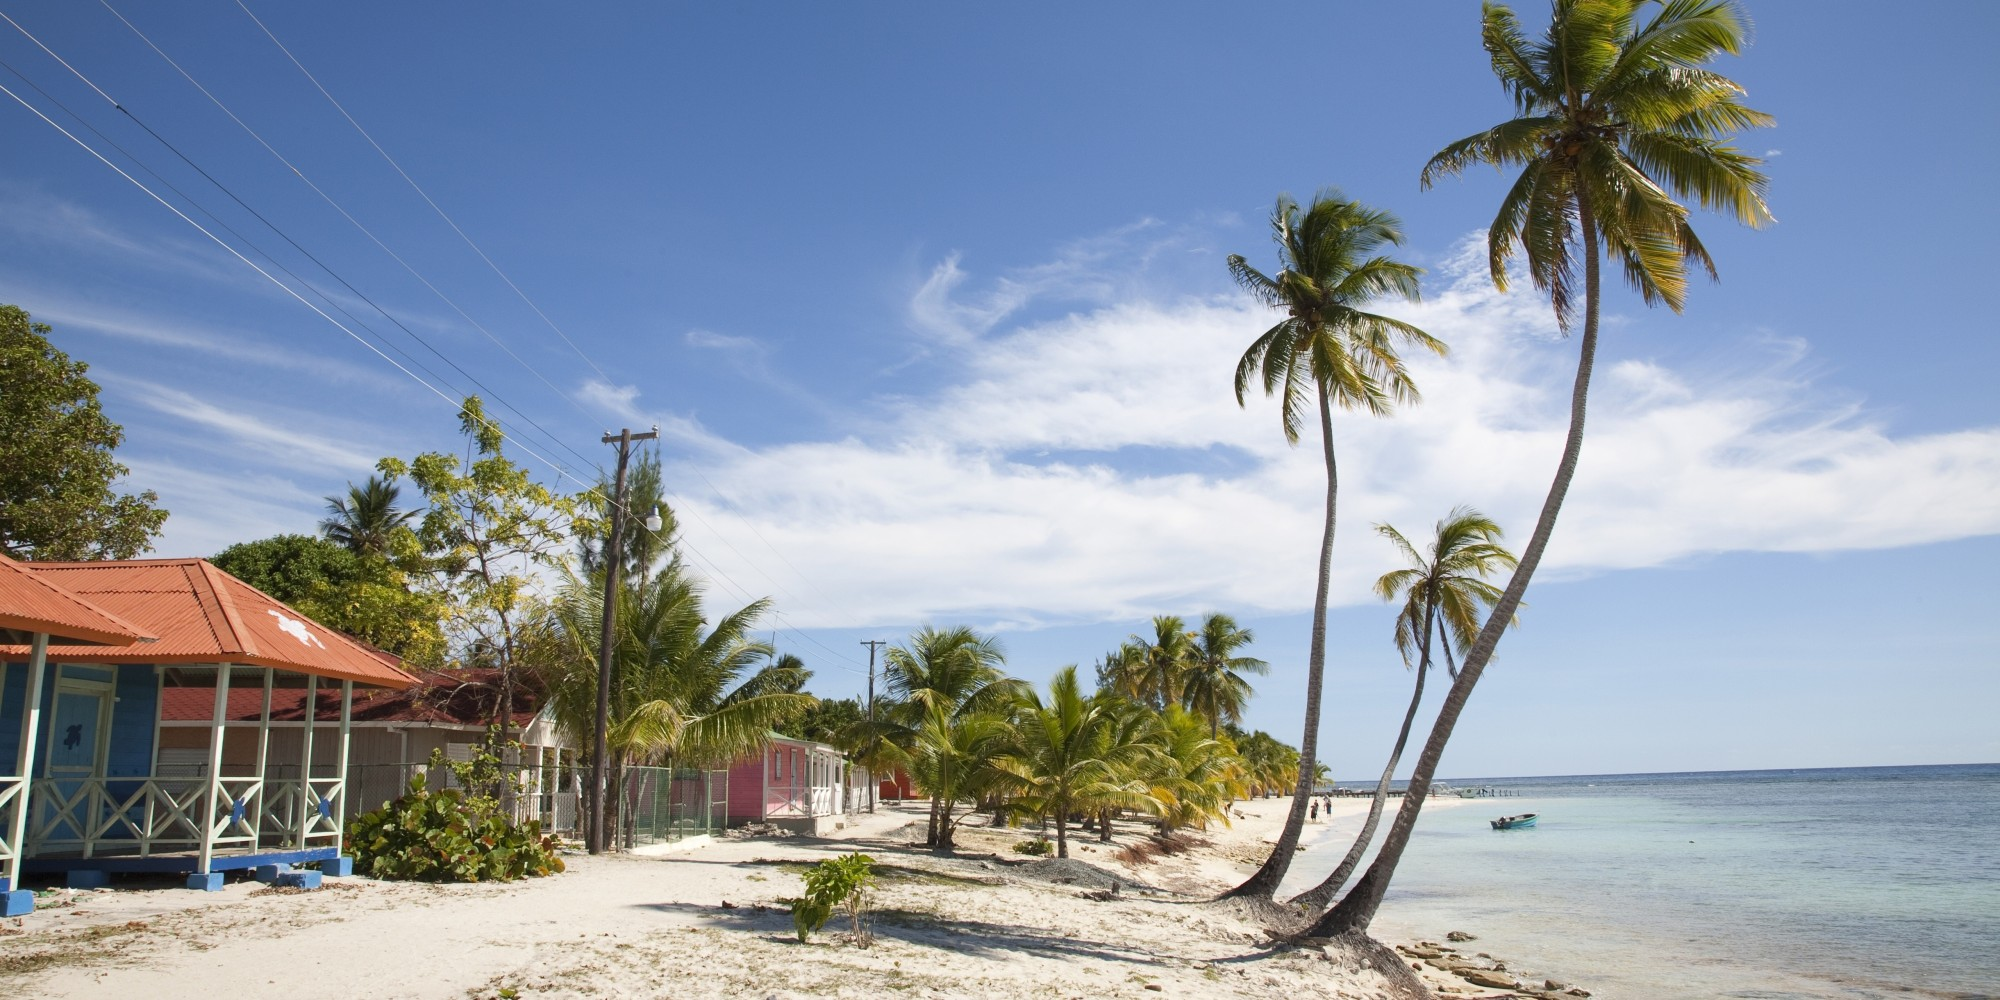 Dominican Republic Beach House For